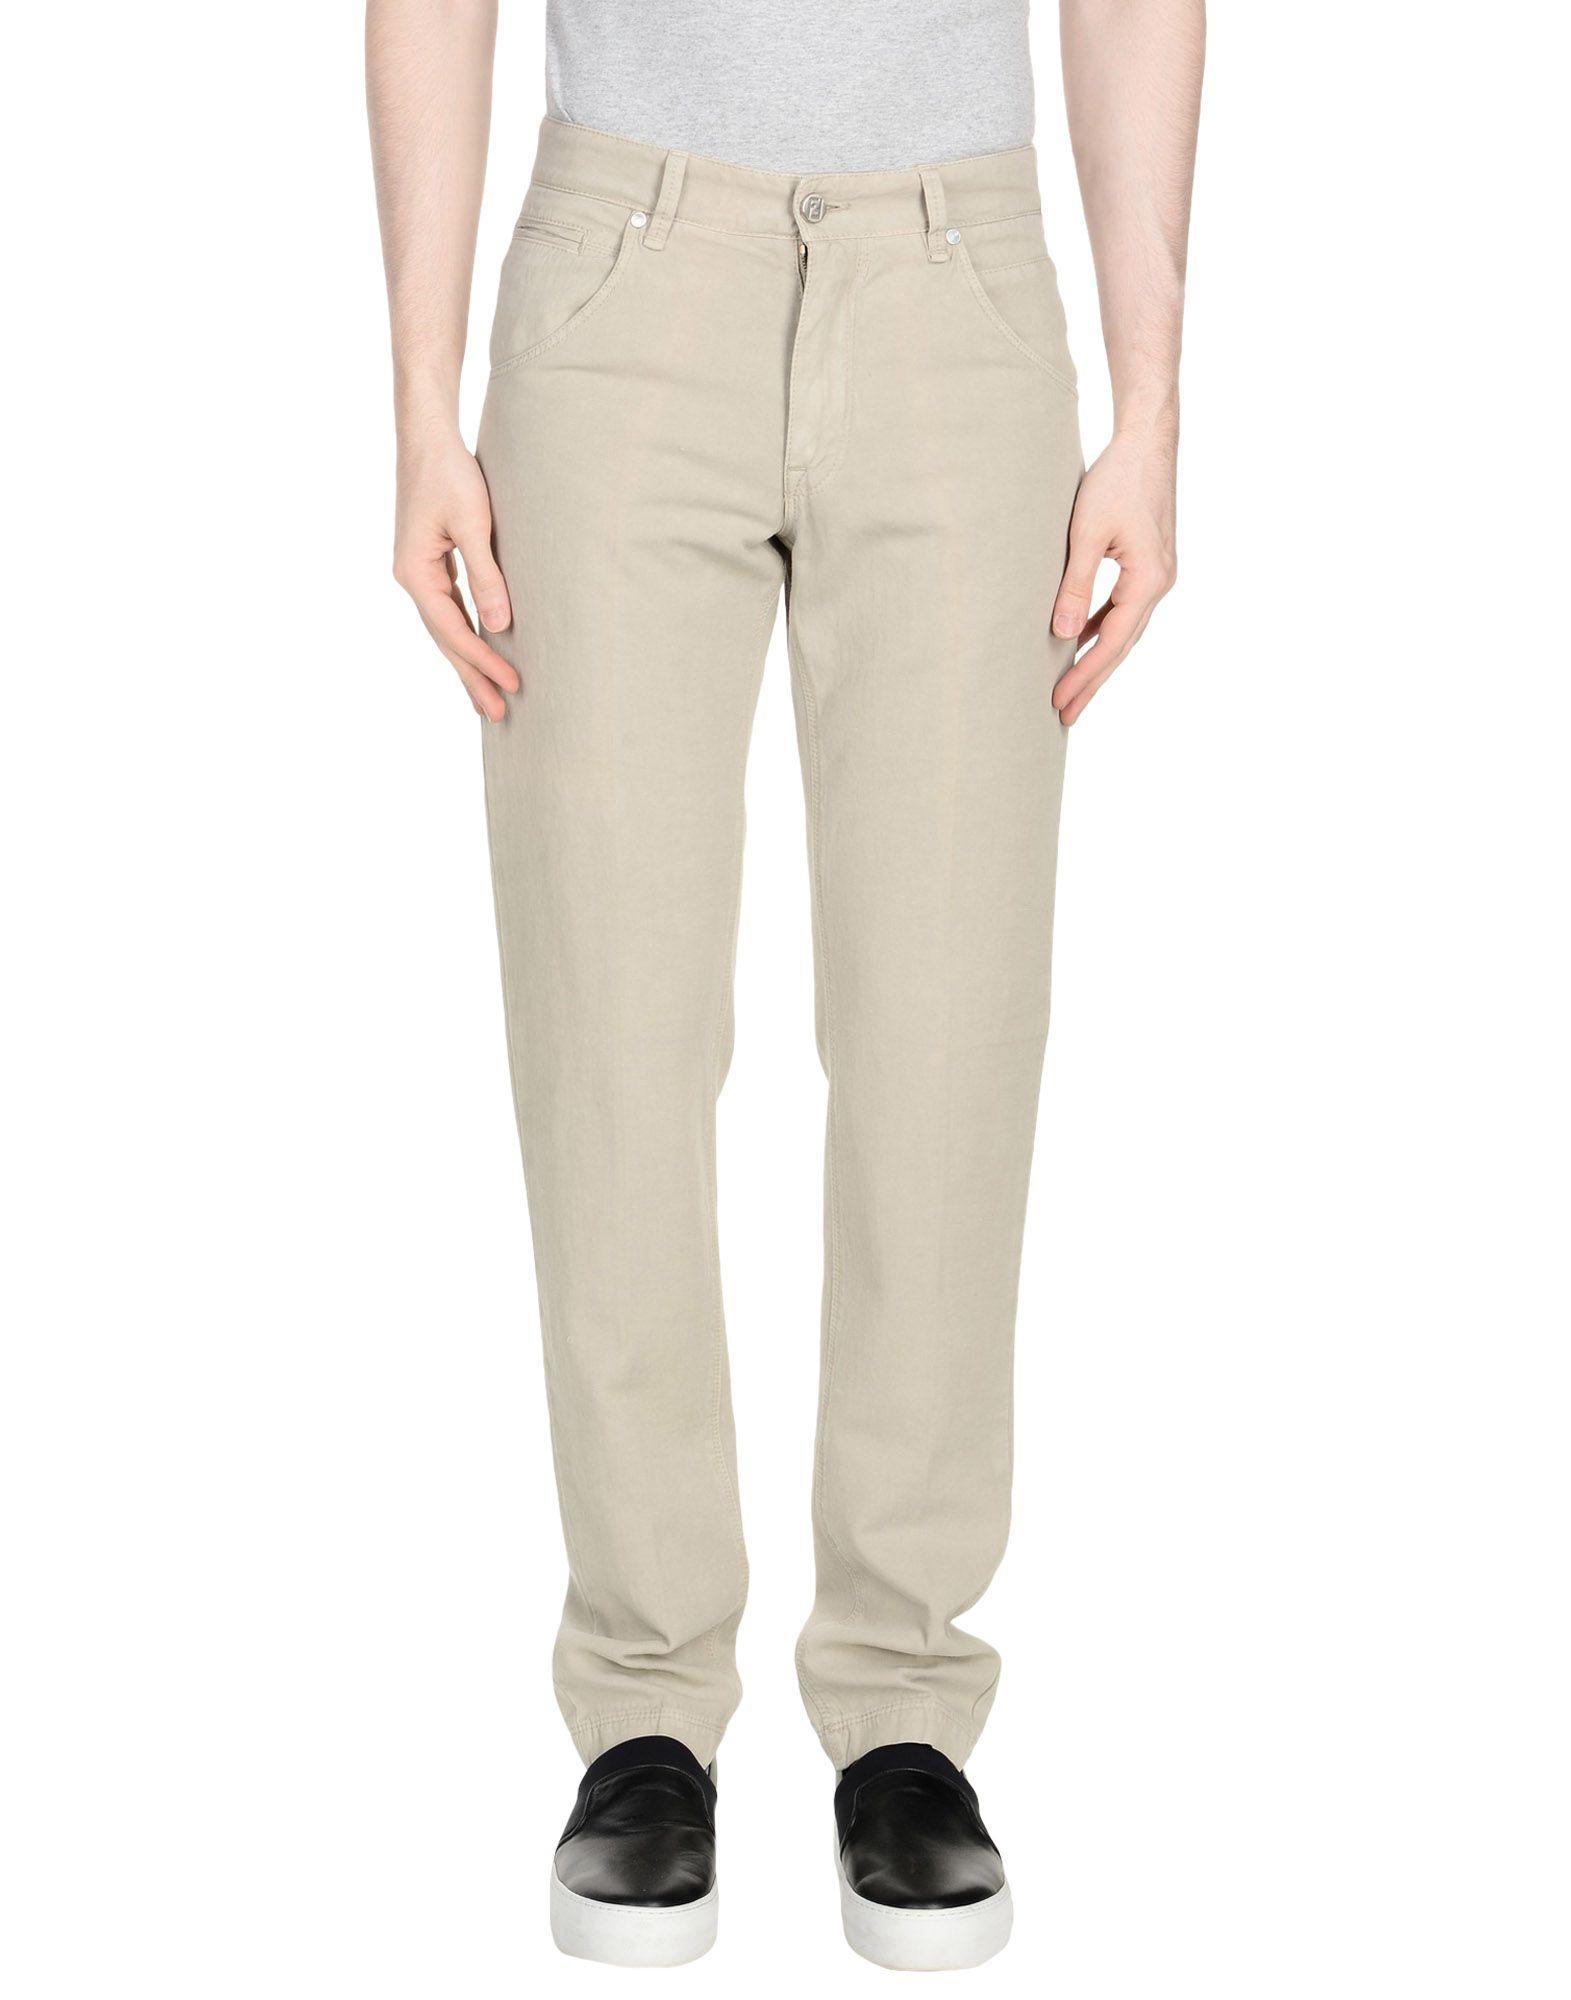 Fendi Casual Pants In Grey